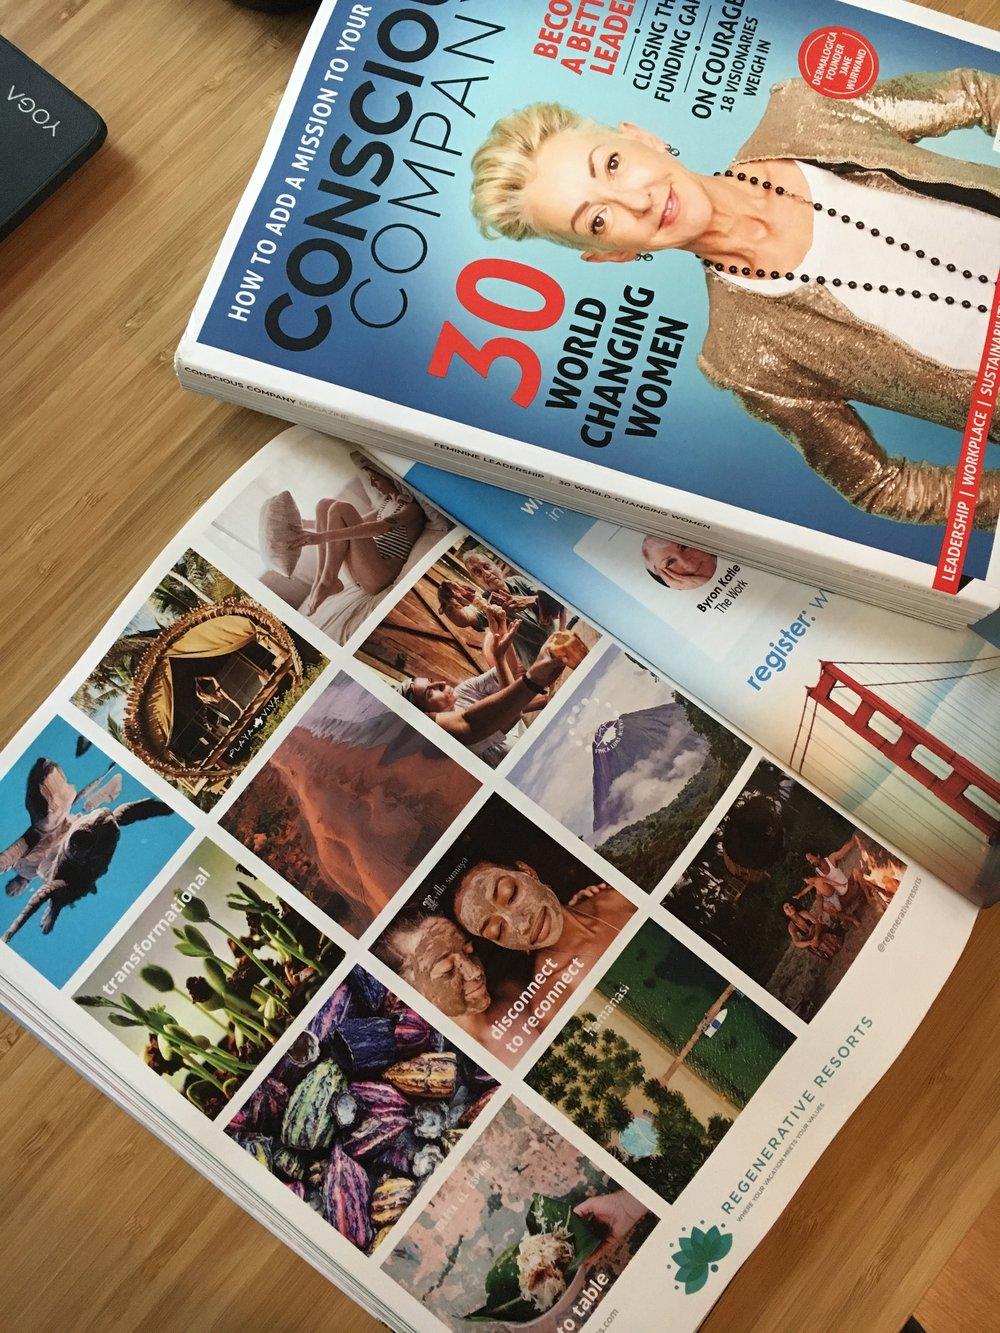 Conscious Company Magazine.JPG